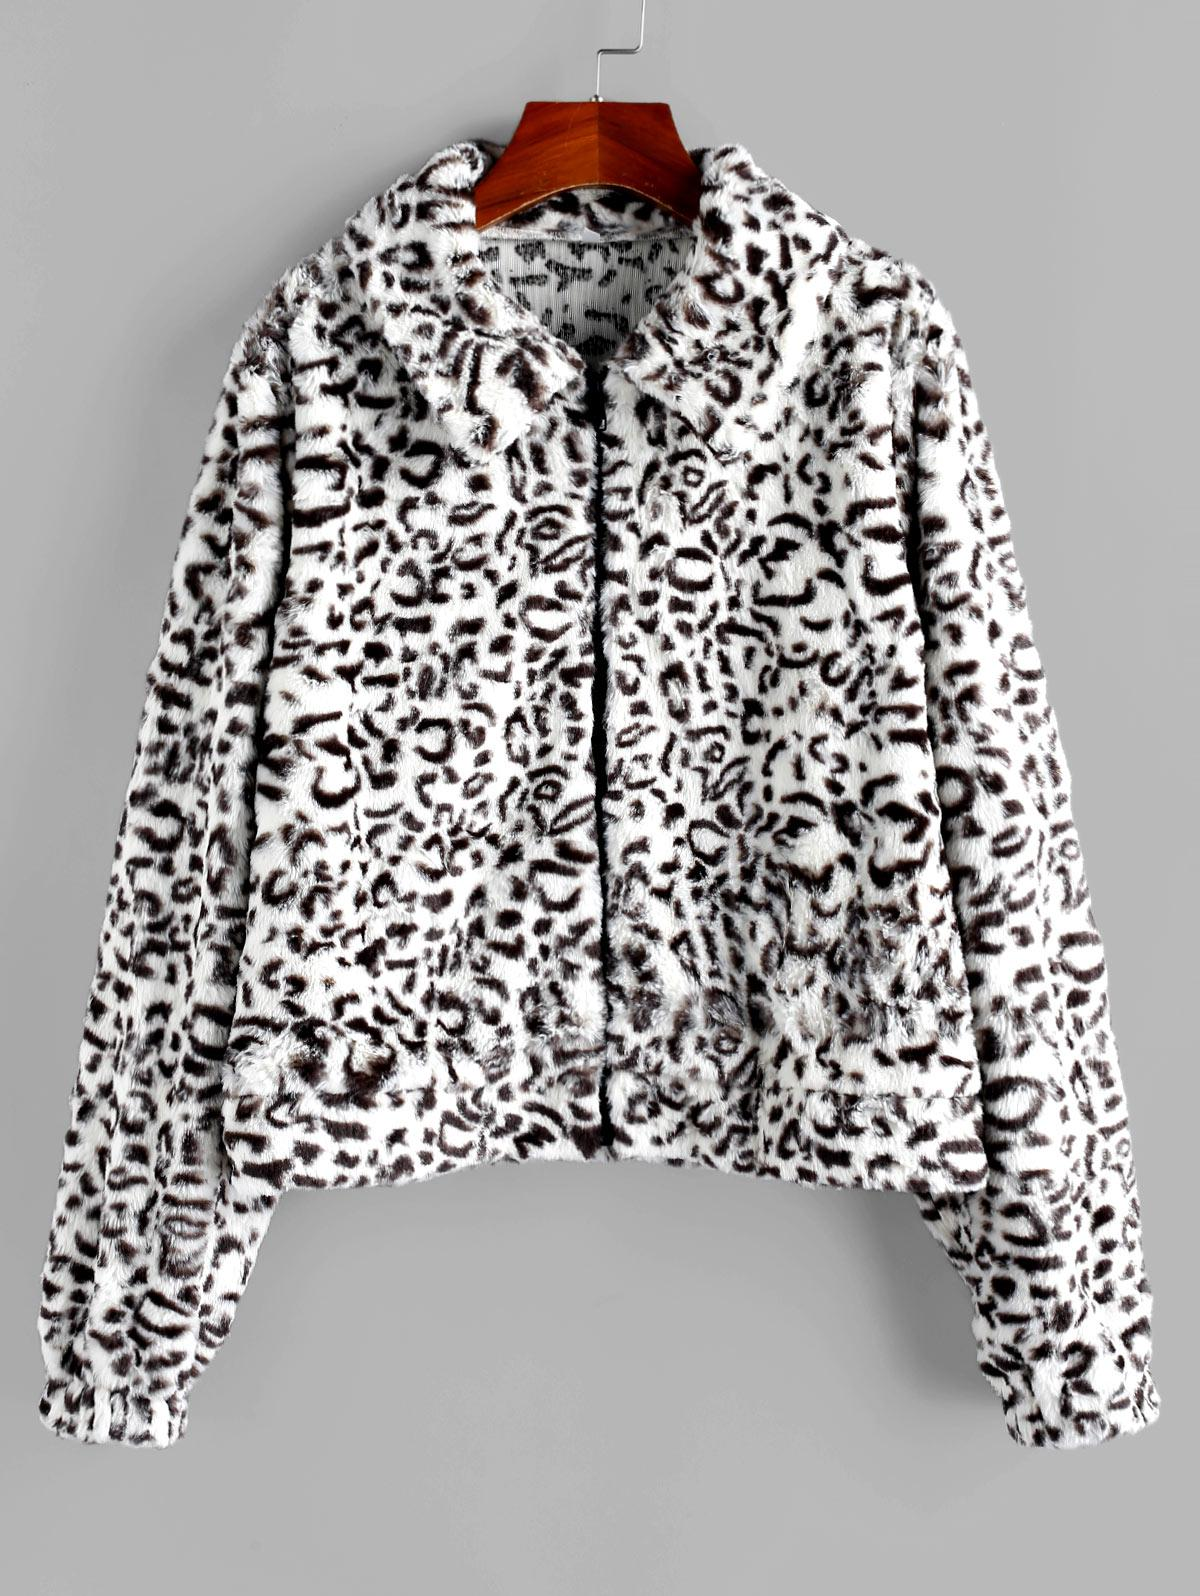 ZAFUL Faux Fur Leopard Fluffy Zipper Coat